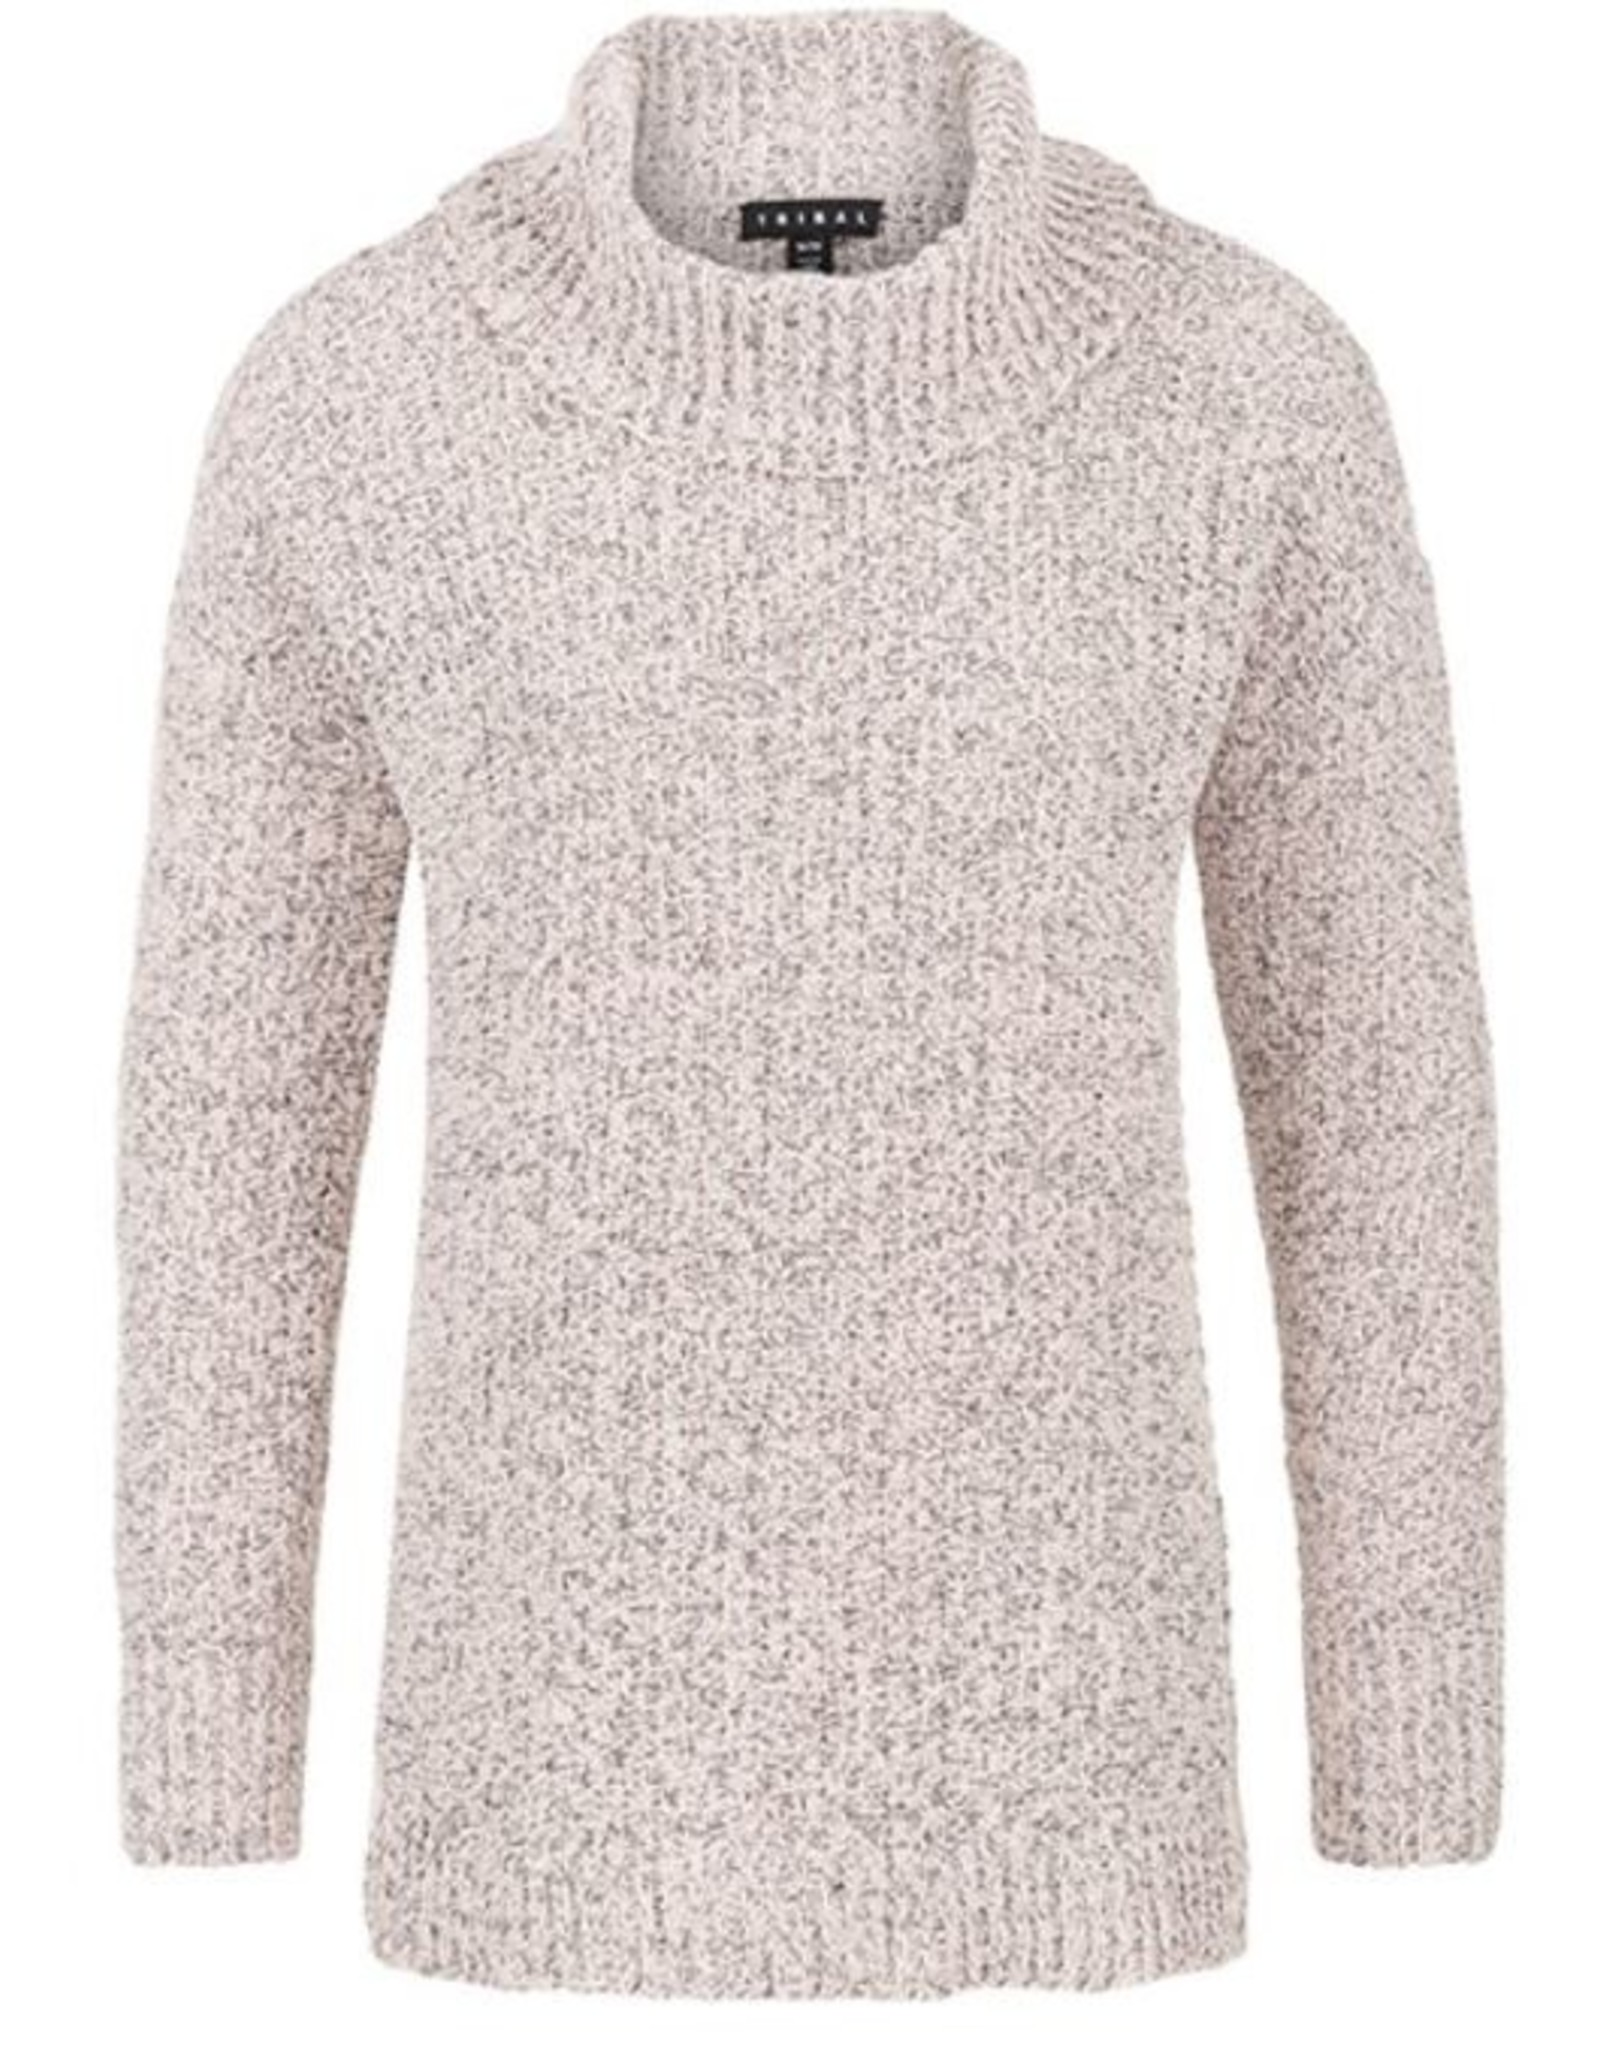 Tribal L/S Cowl Nk Sweater - 91af